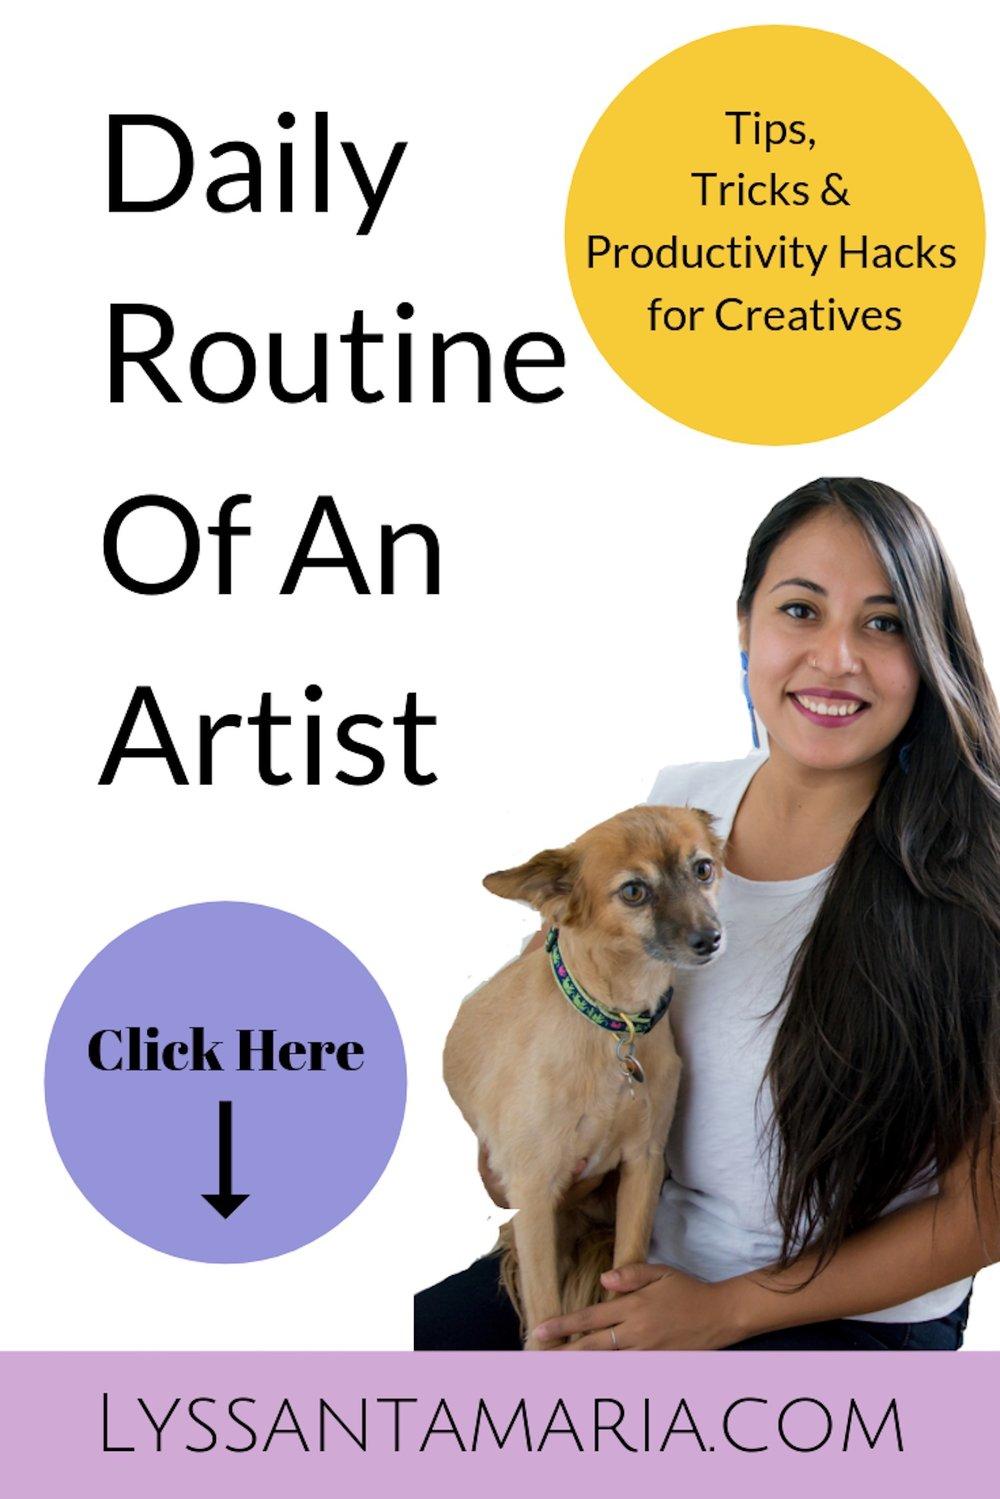 Daily Routine of Beadwork Artist - Tips, Tricks and Productivity Hacks - PINTEREST.jpg